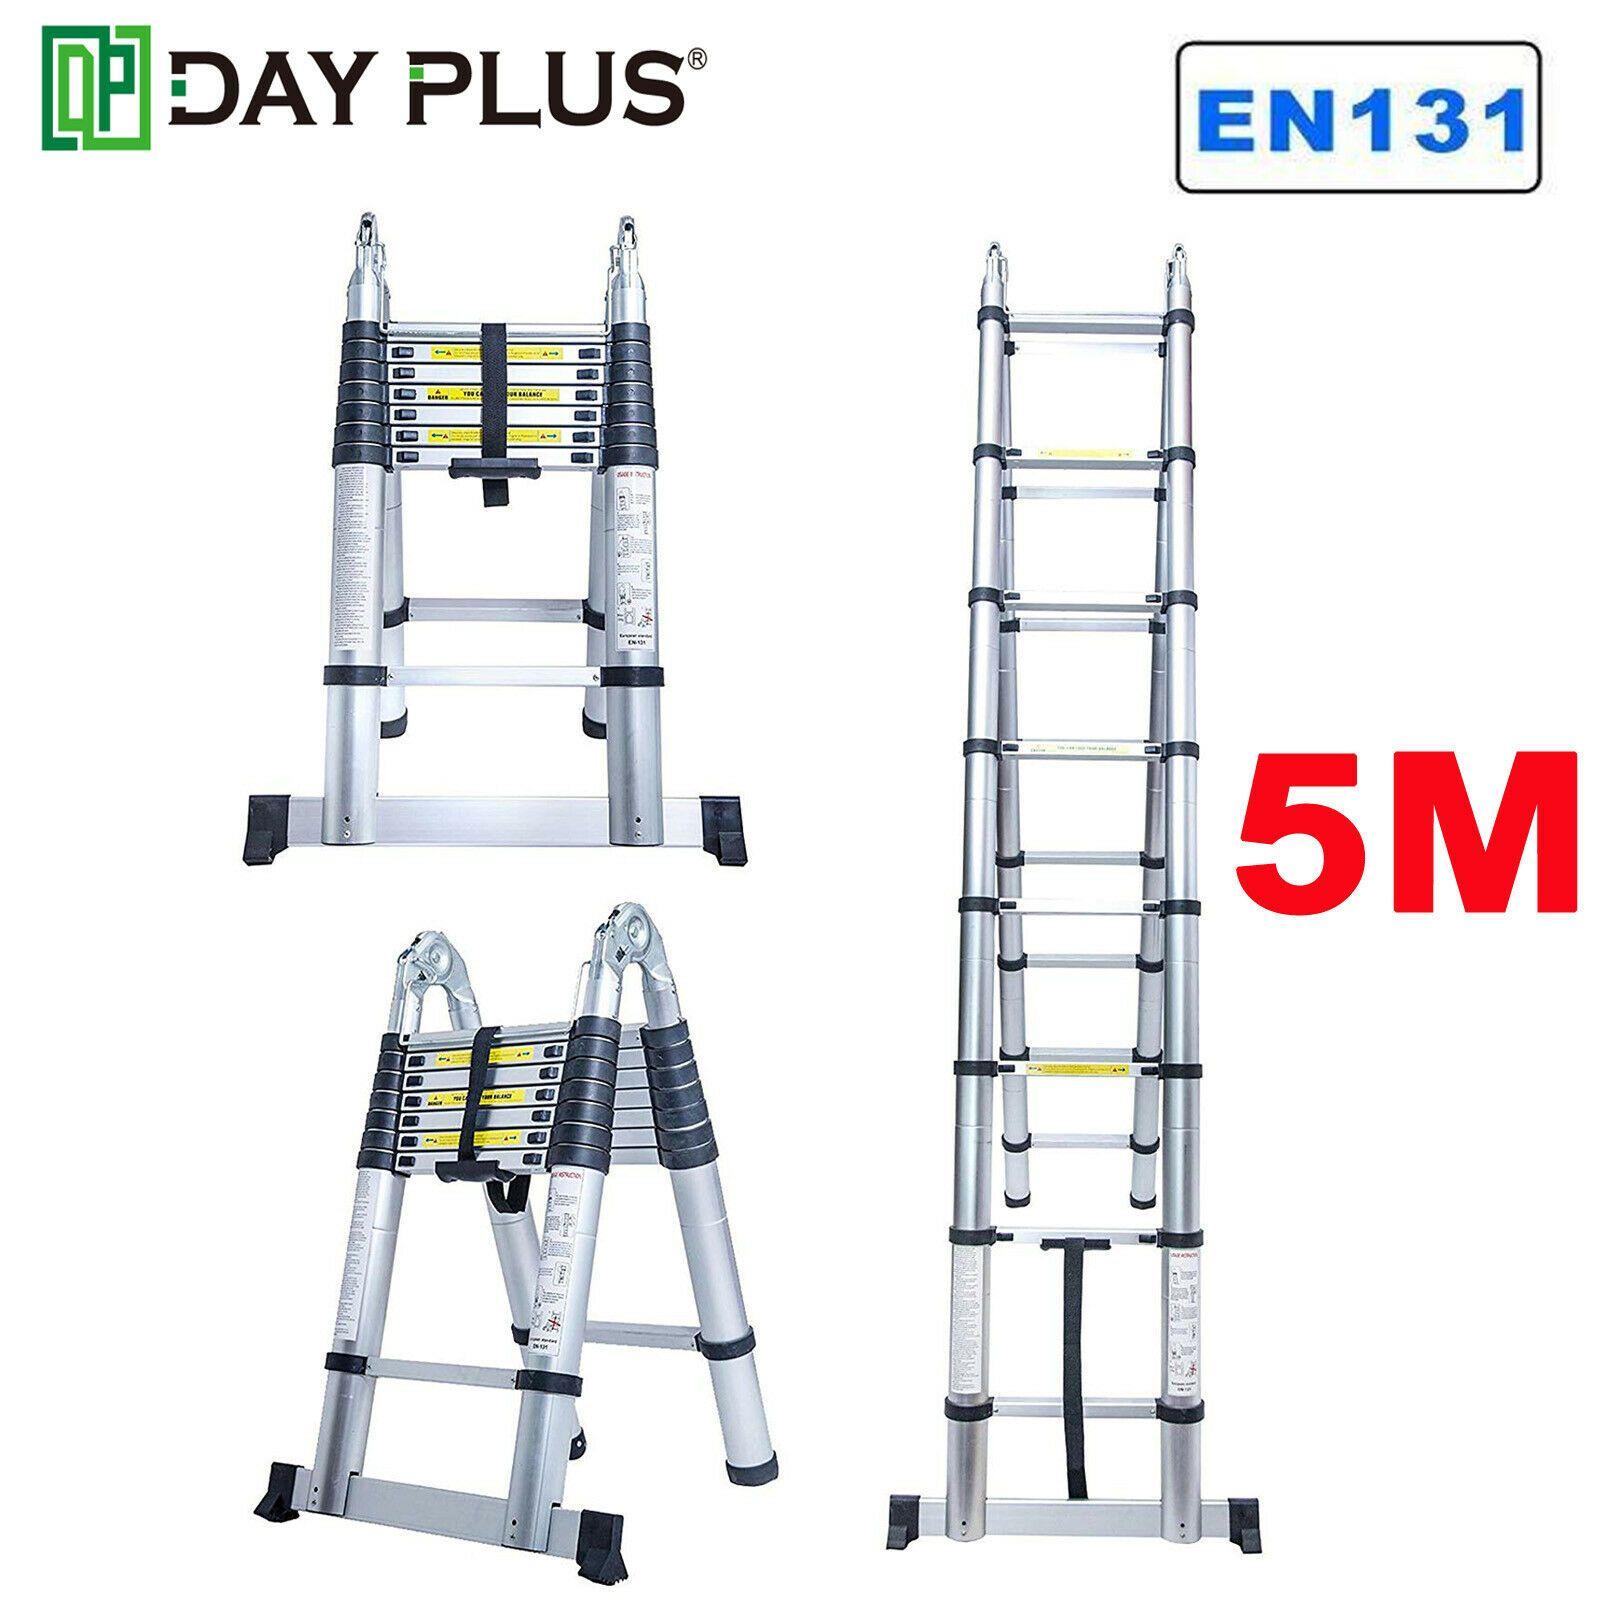 16 5ft Flexible Telescopic Aluminum Extension Fold Ladder Steps Heavy Duty Tool Ladder Decor Ladderdecor In 2020 Telescopic Ladder Aluminum Extension Ladder Decor